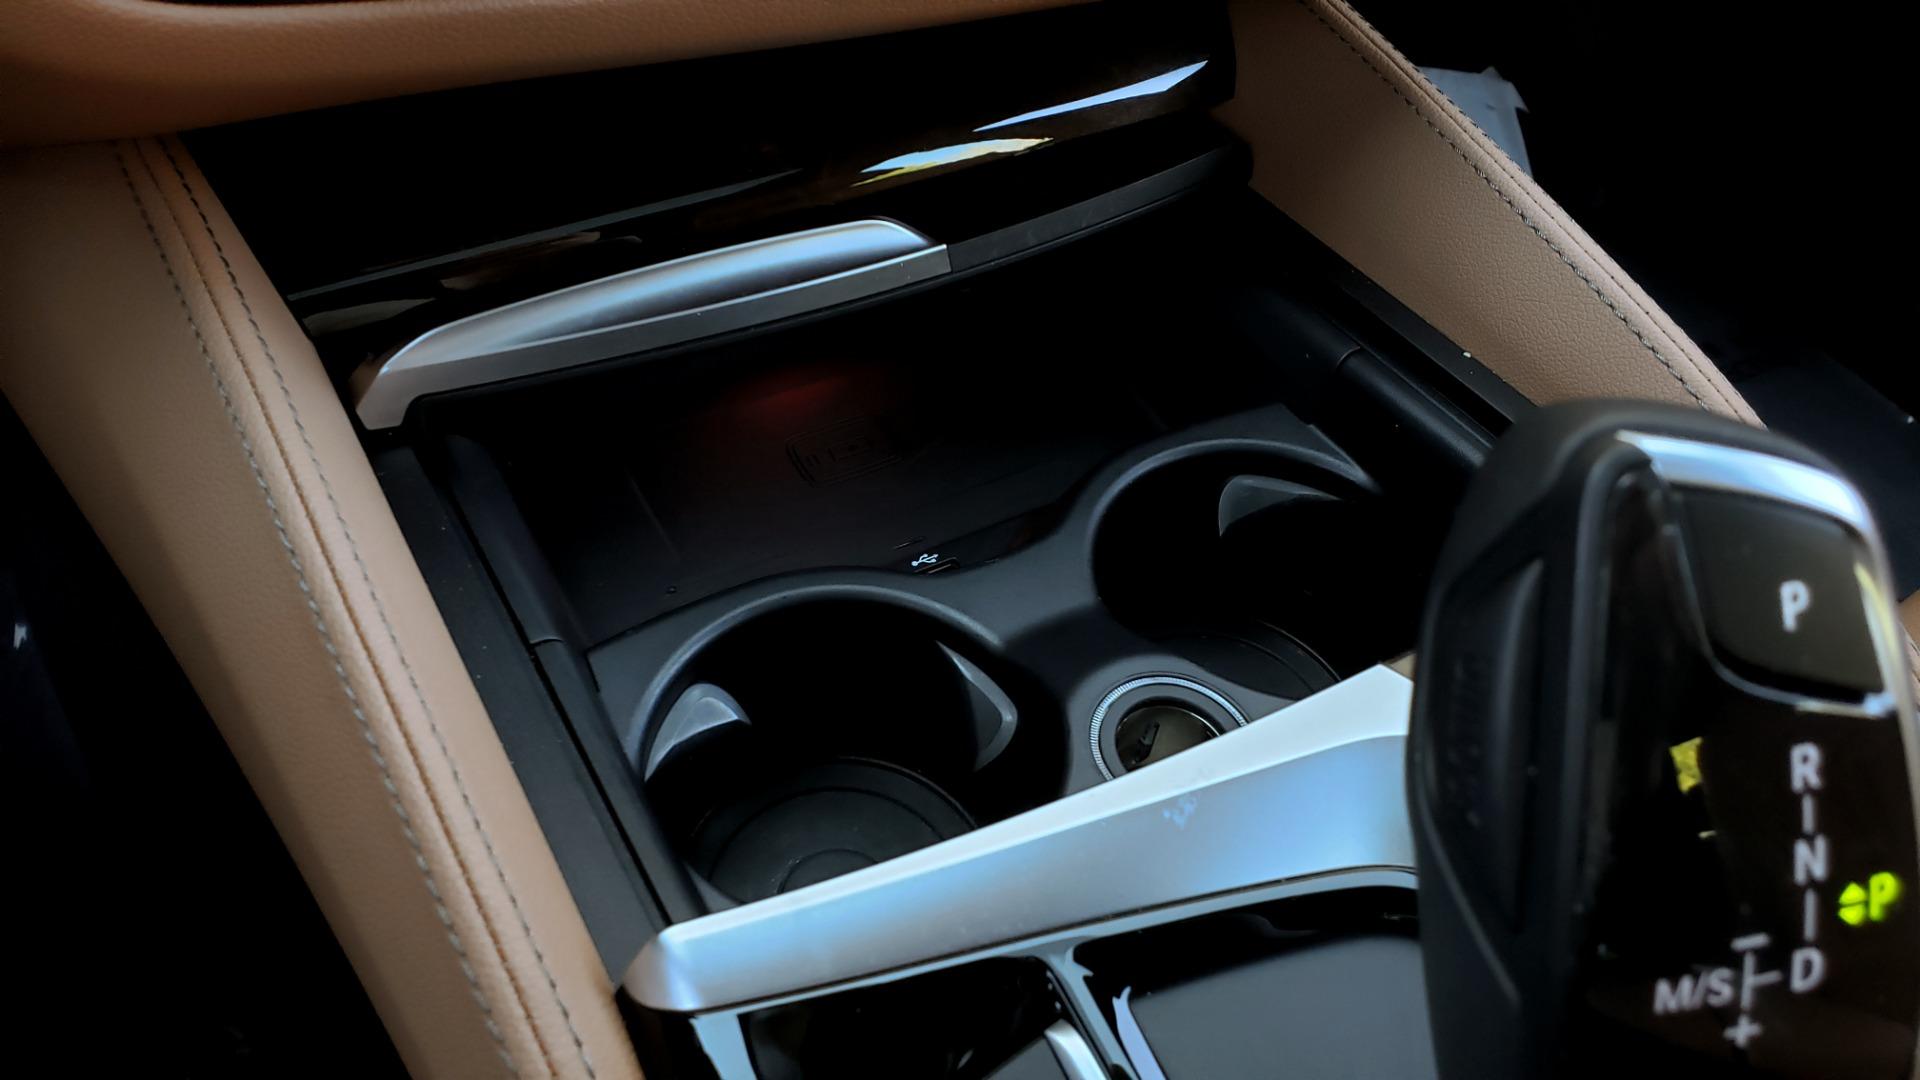 Used 2018 BMW 5 SERIES 540I M-SPORT / DRVR ASST / EXEC PKG / NAV / SUNROOF / HUD / REARVIEW for sale Sold at Formula Imports in Charlotte NC 28227 53